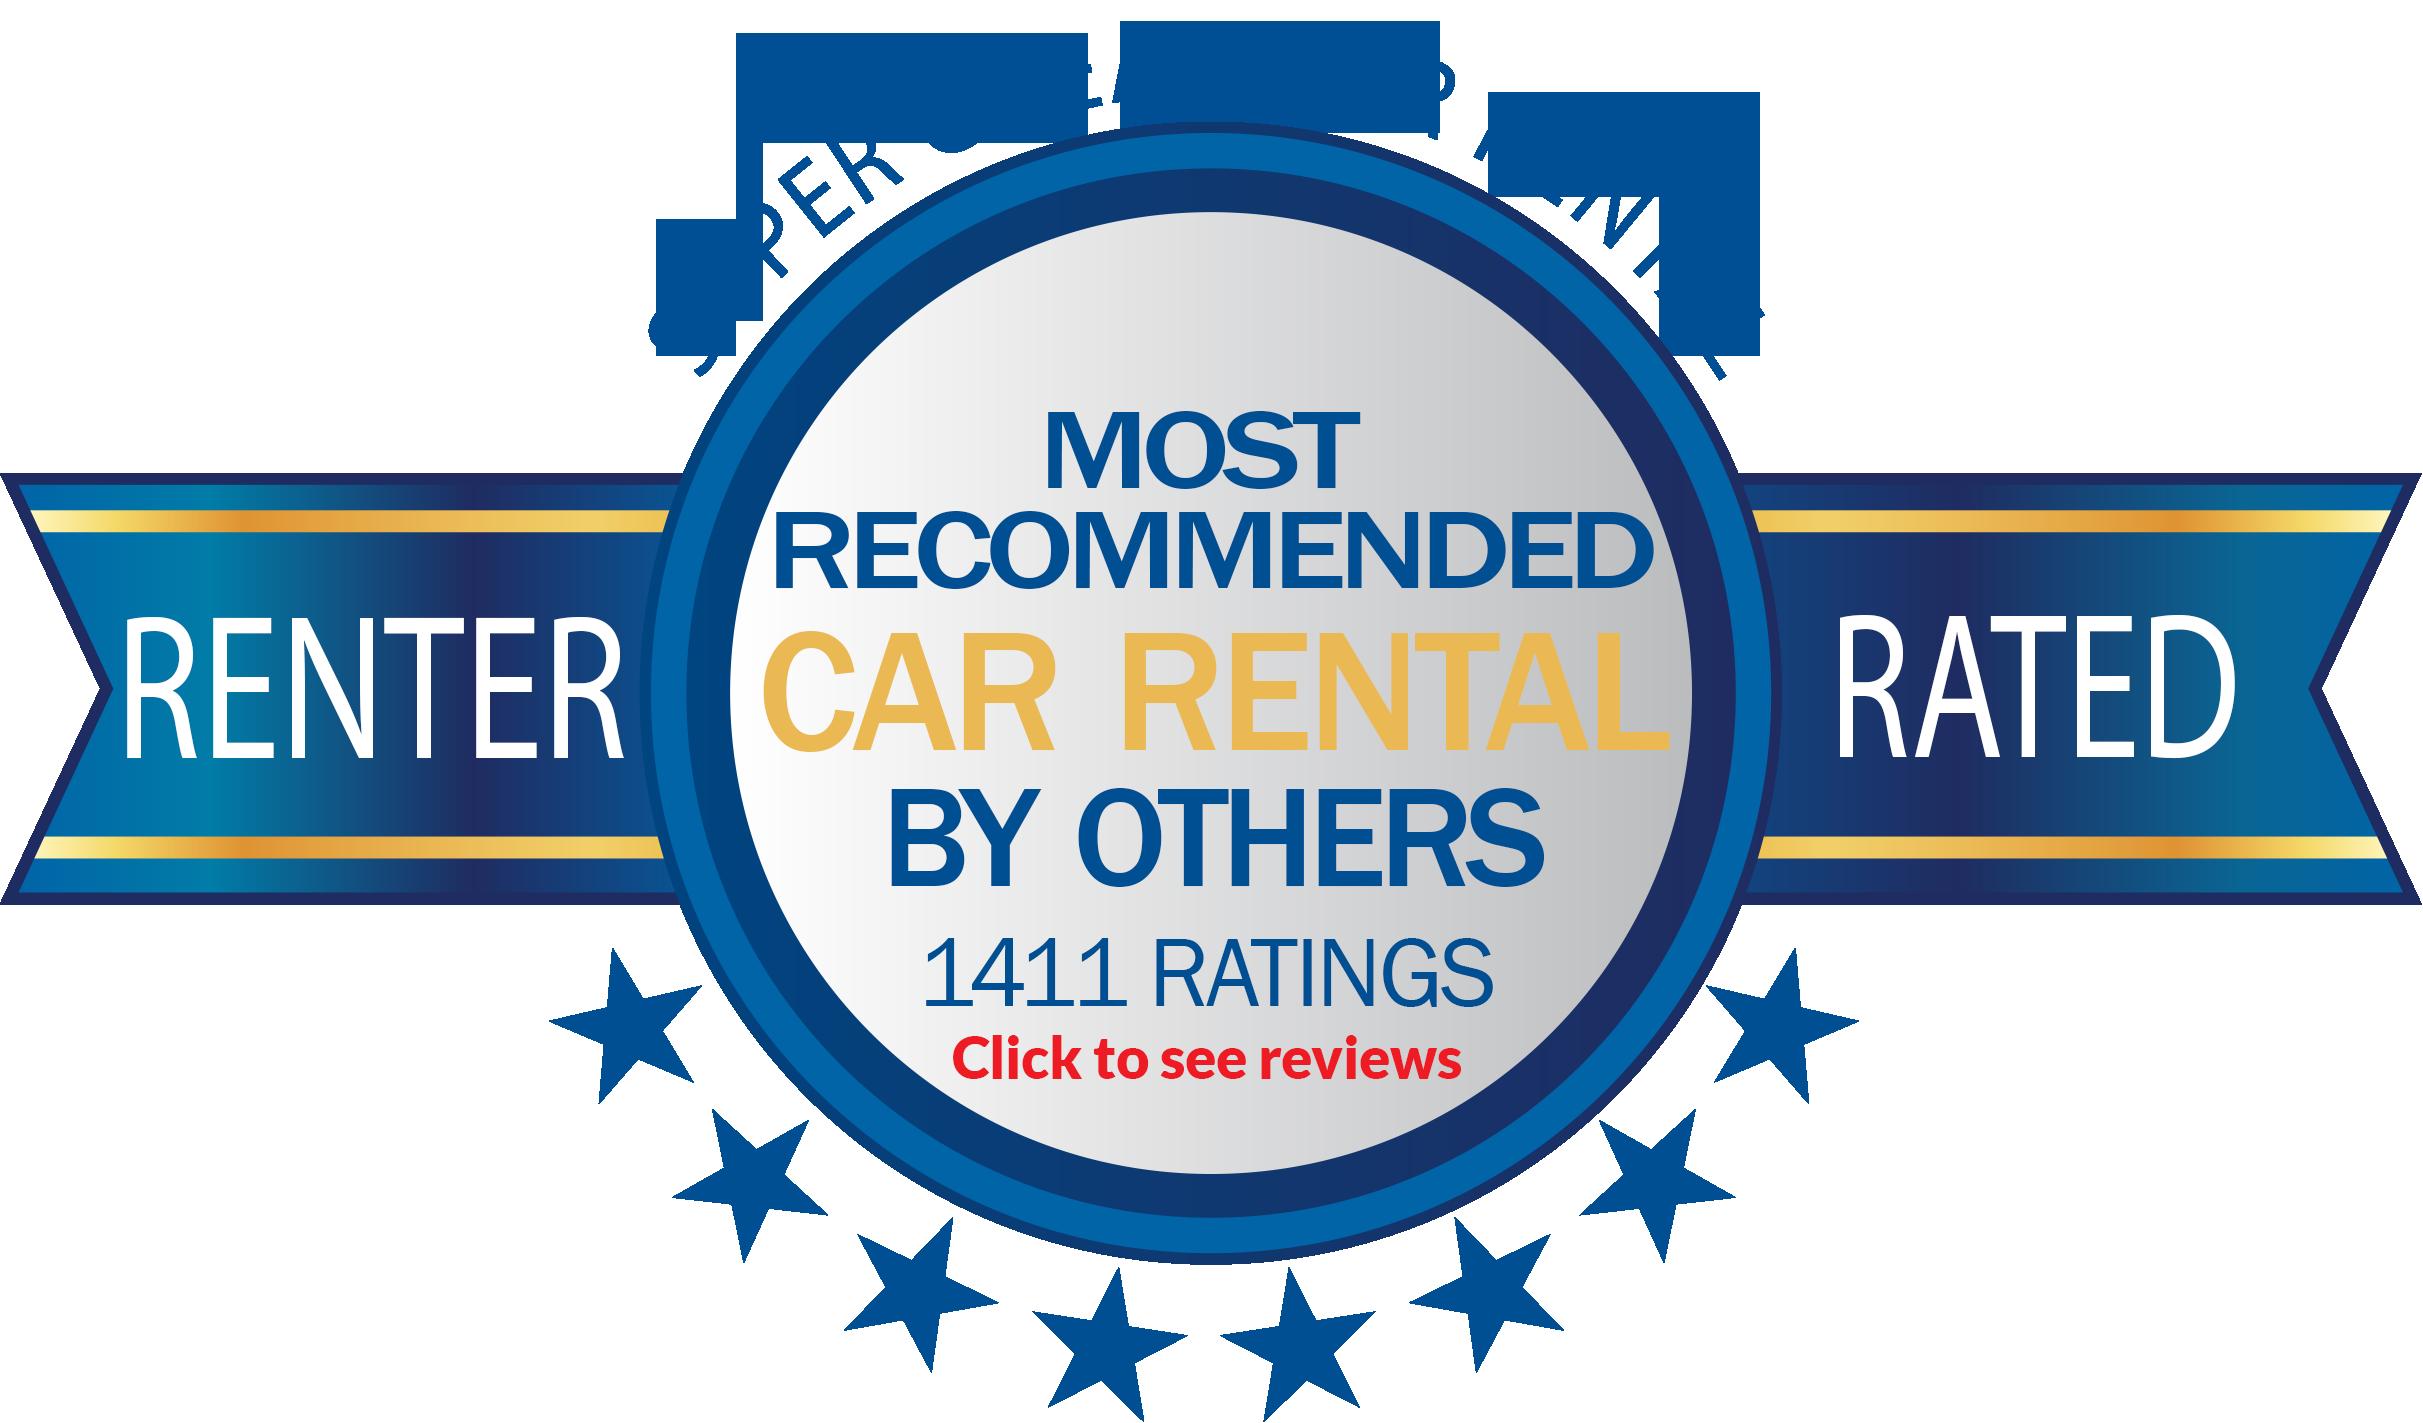 Home With Images Cheap Car Rental Car Rental Cheap Cars